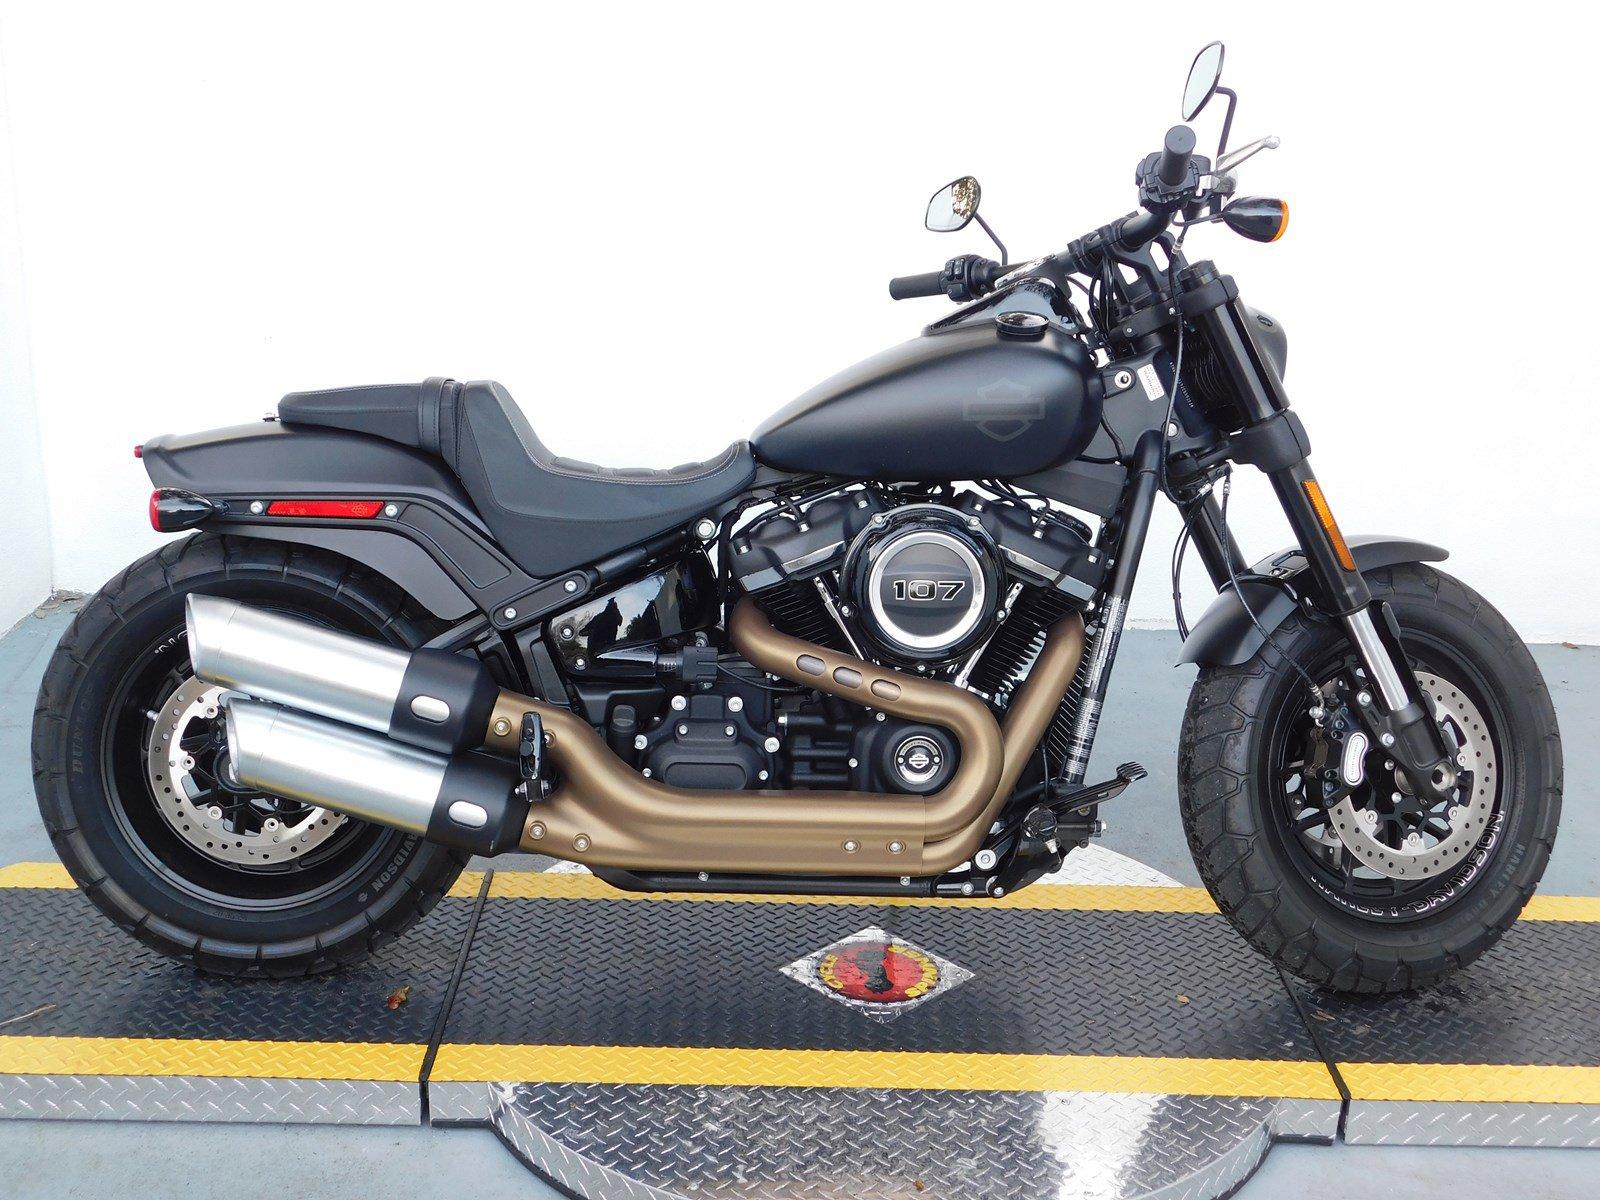 Pre-Owned 2018 Harley-Davidson Softail Fat Bob FXFB